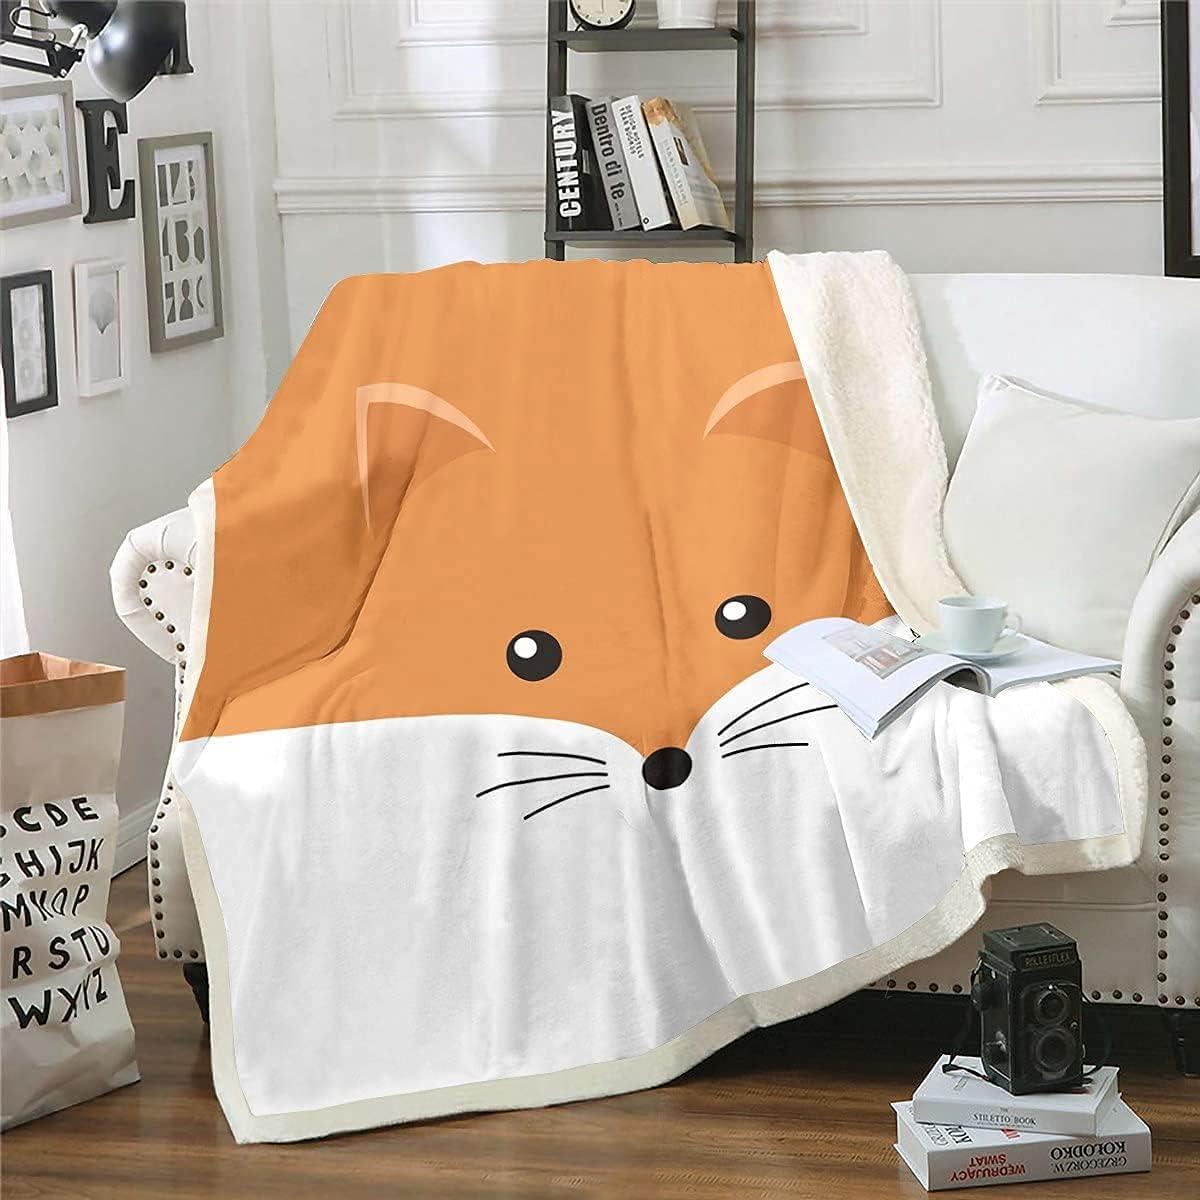 LAYENJOY Kids Fox Throw Max 74% OFF Blanket Boys Over item handling ☆ Girls Wo Cute 50